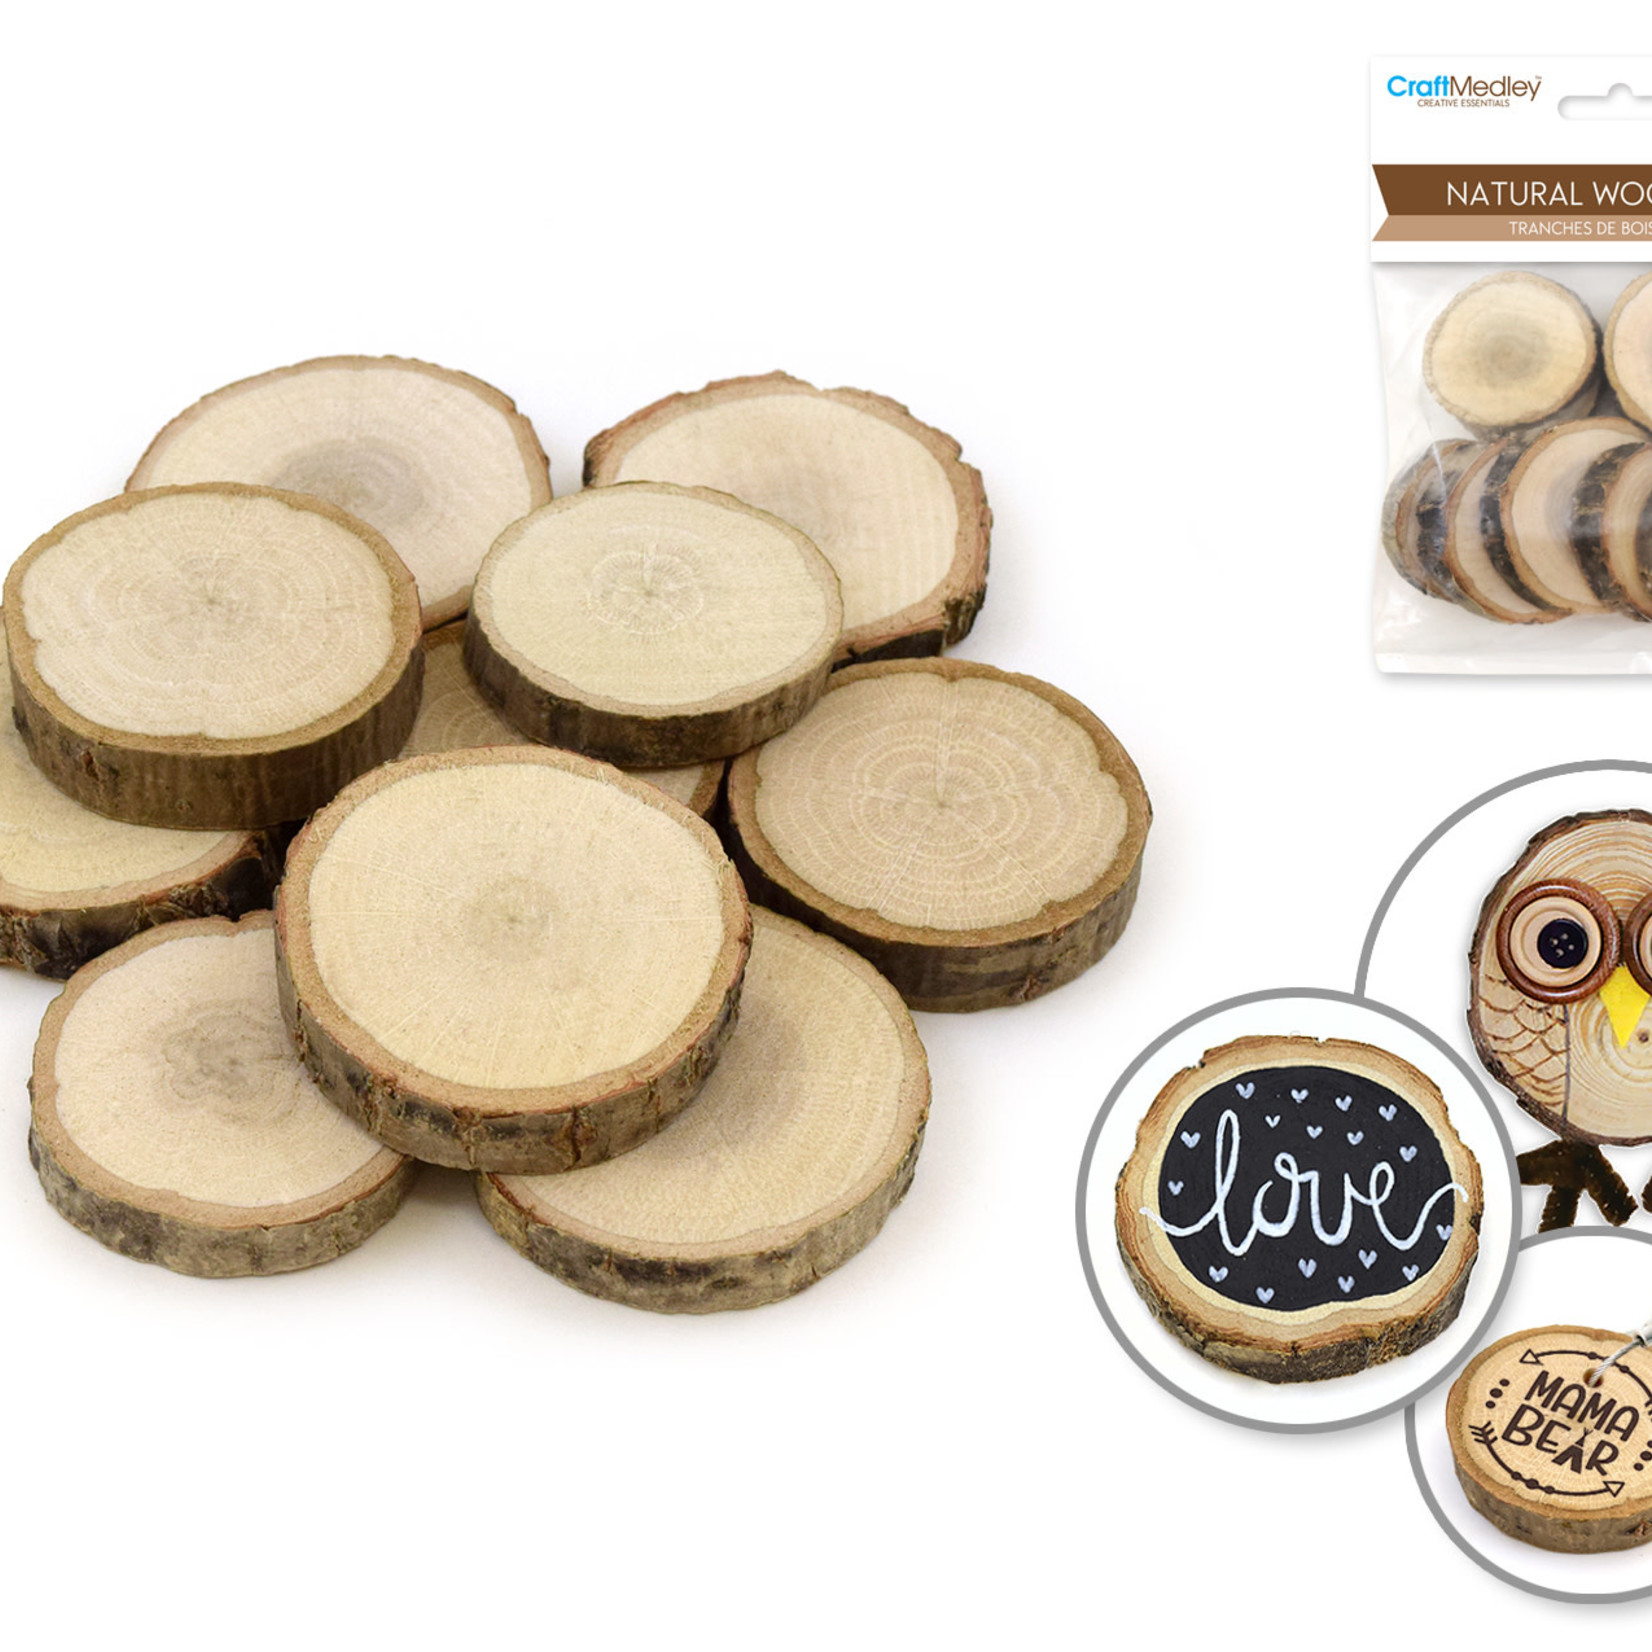 Natural Wood Slices